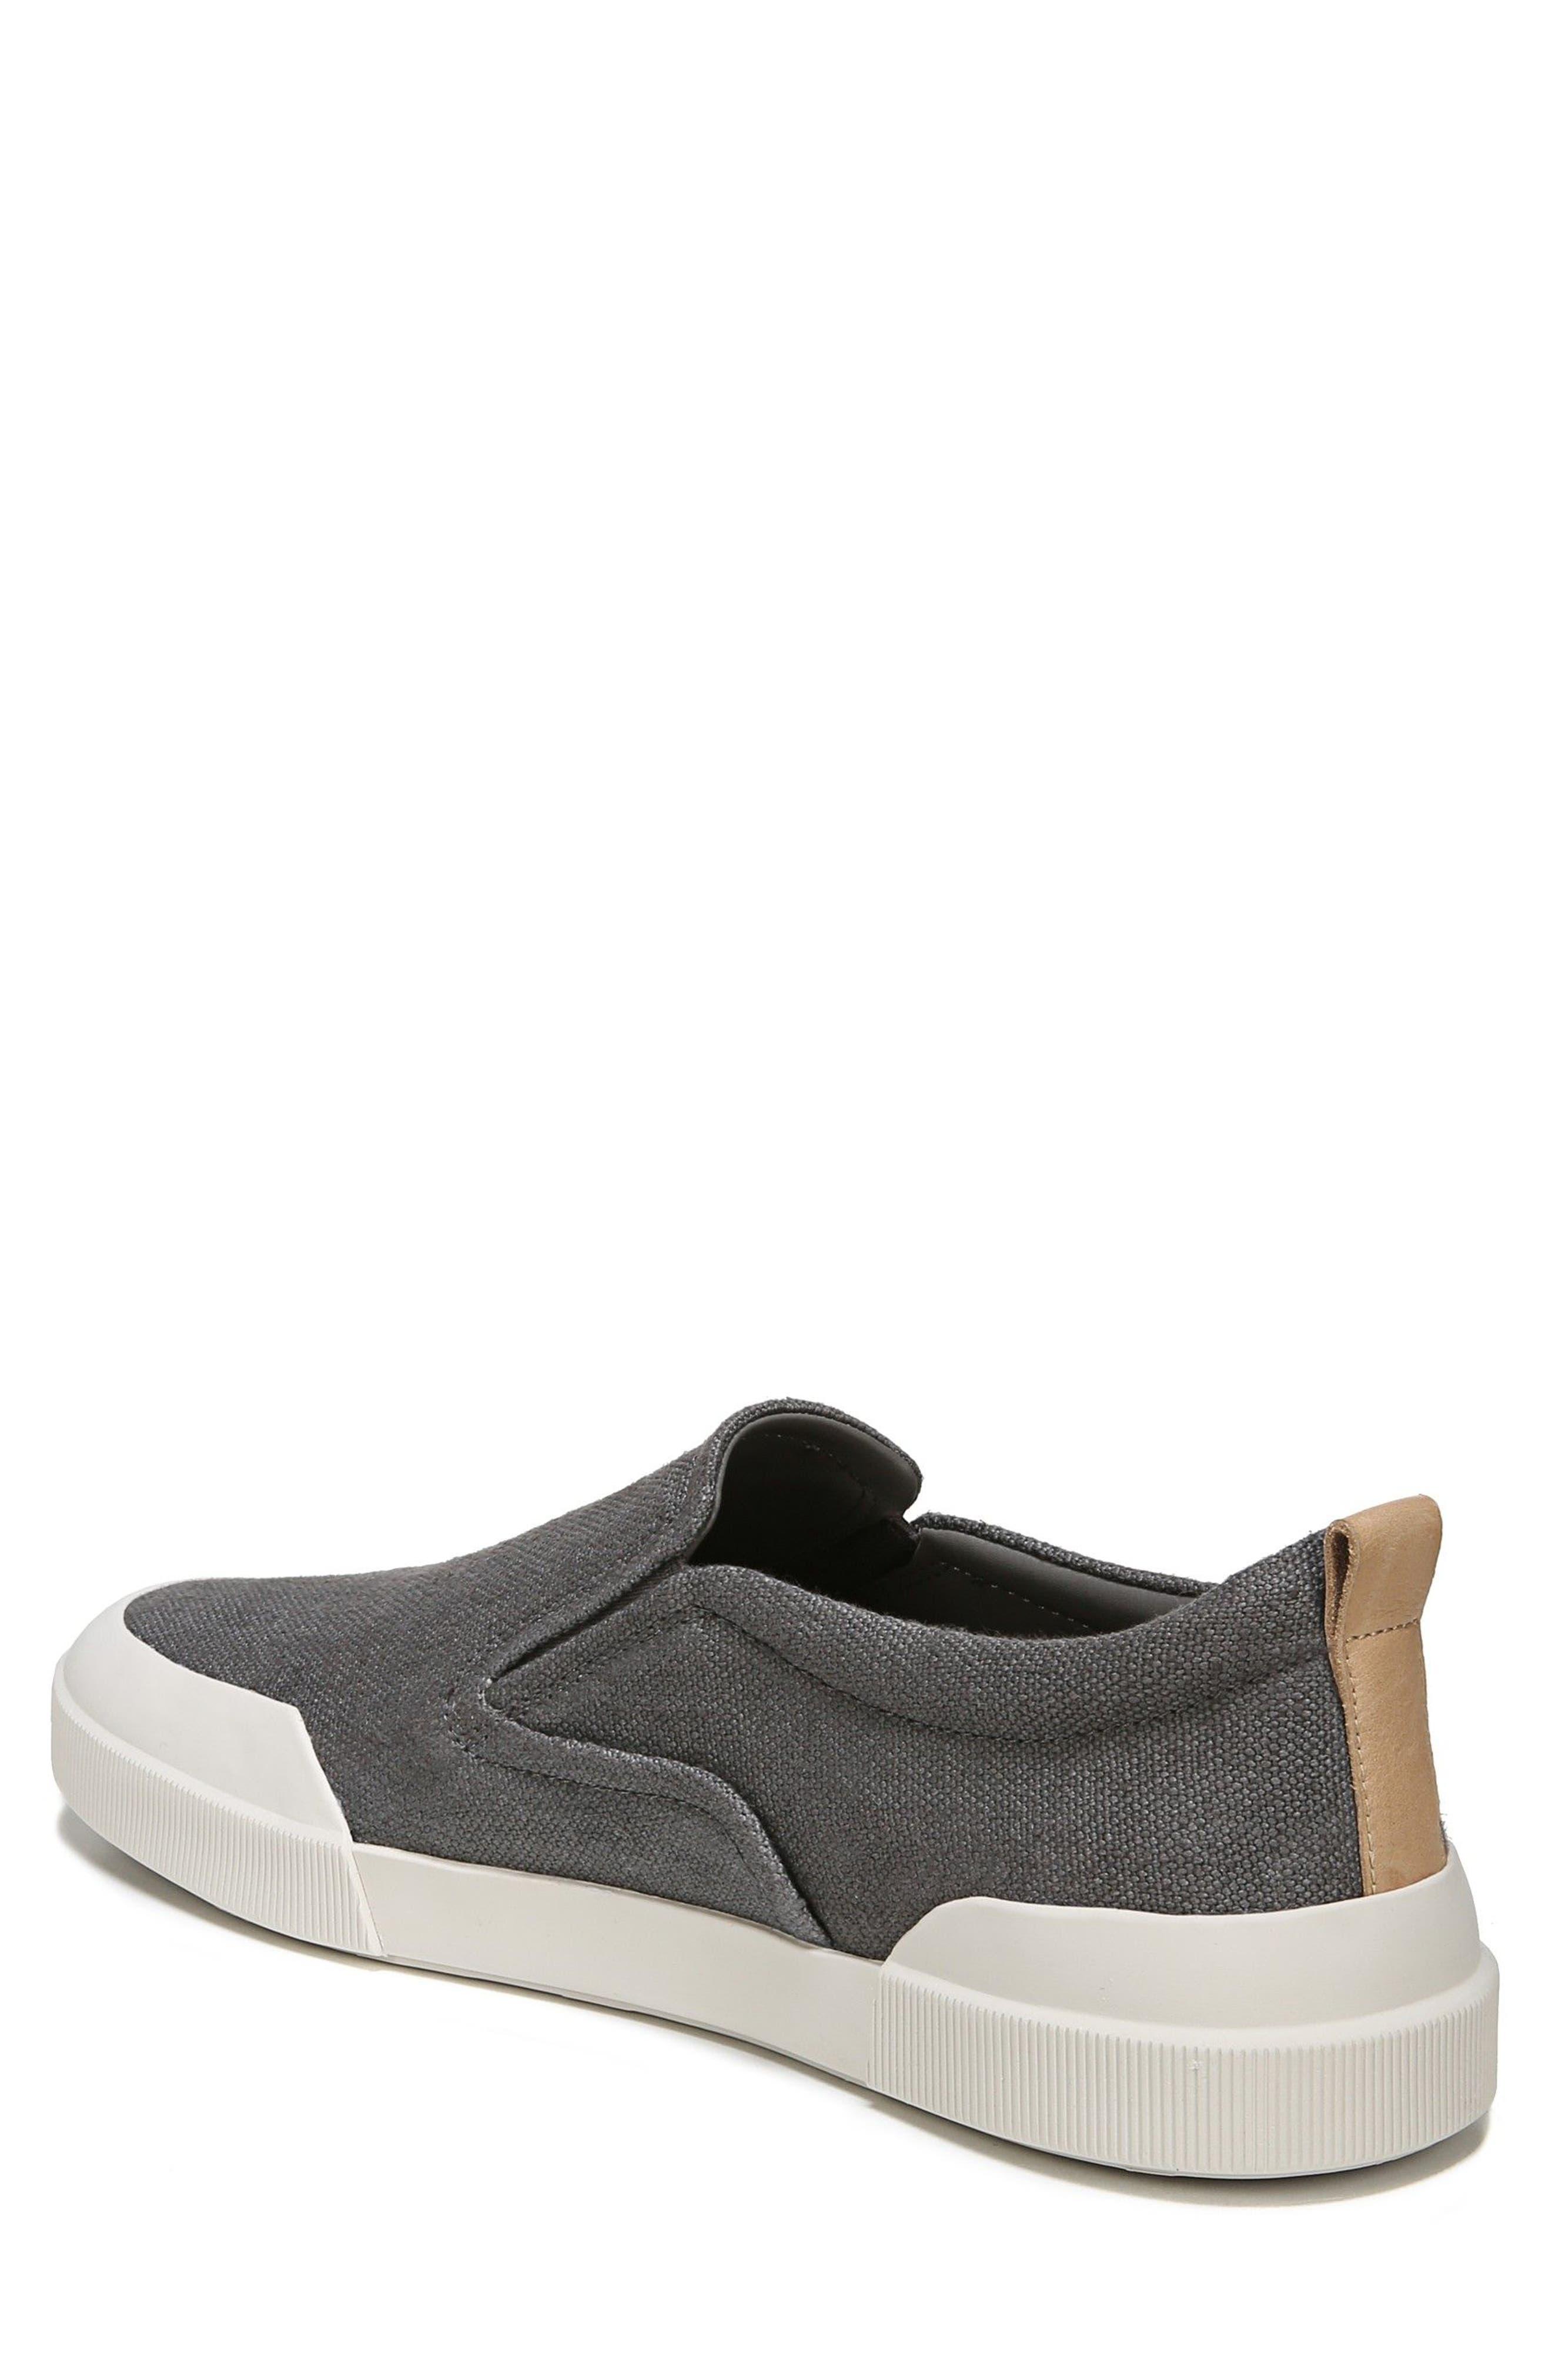 Vernon Slip-On Sneaker,                             Alternate thumbnail 2, color,                             Graphite/ Cuoio